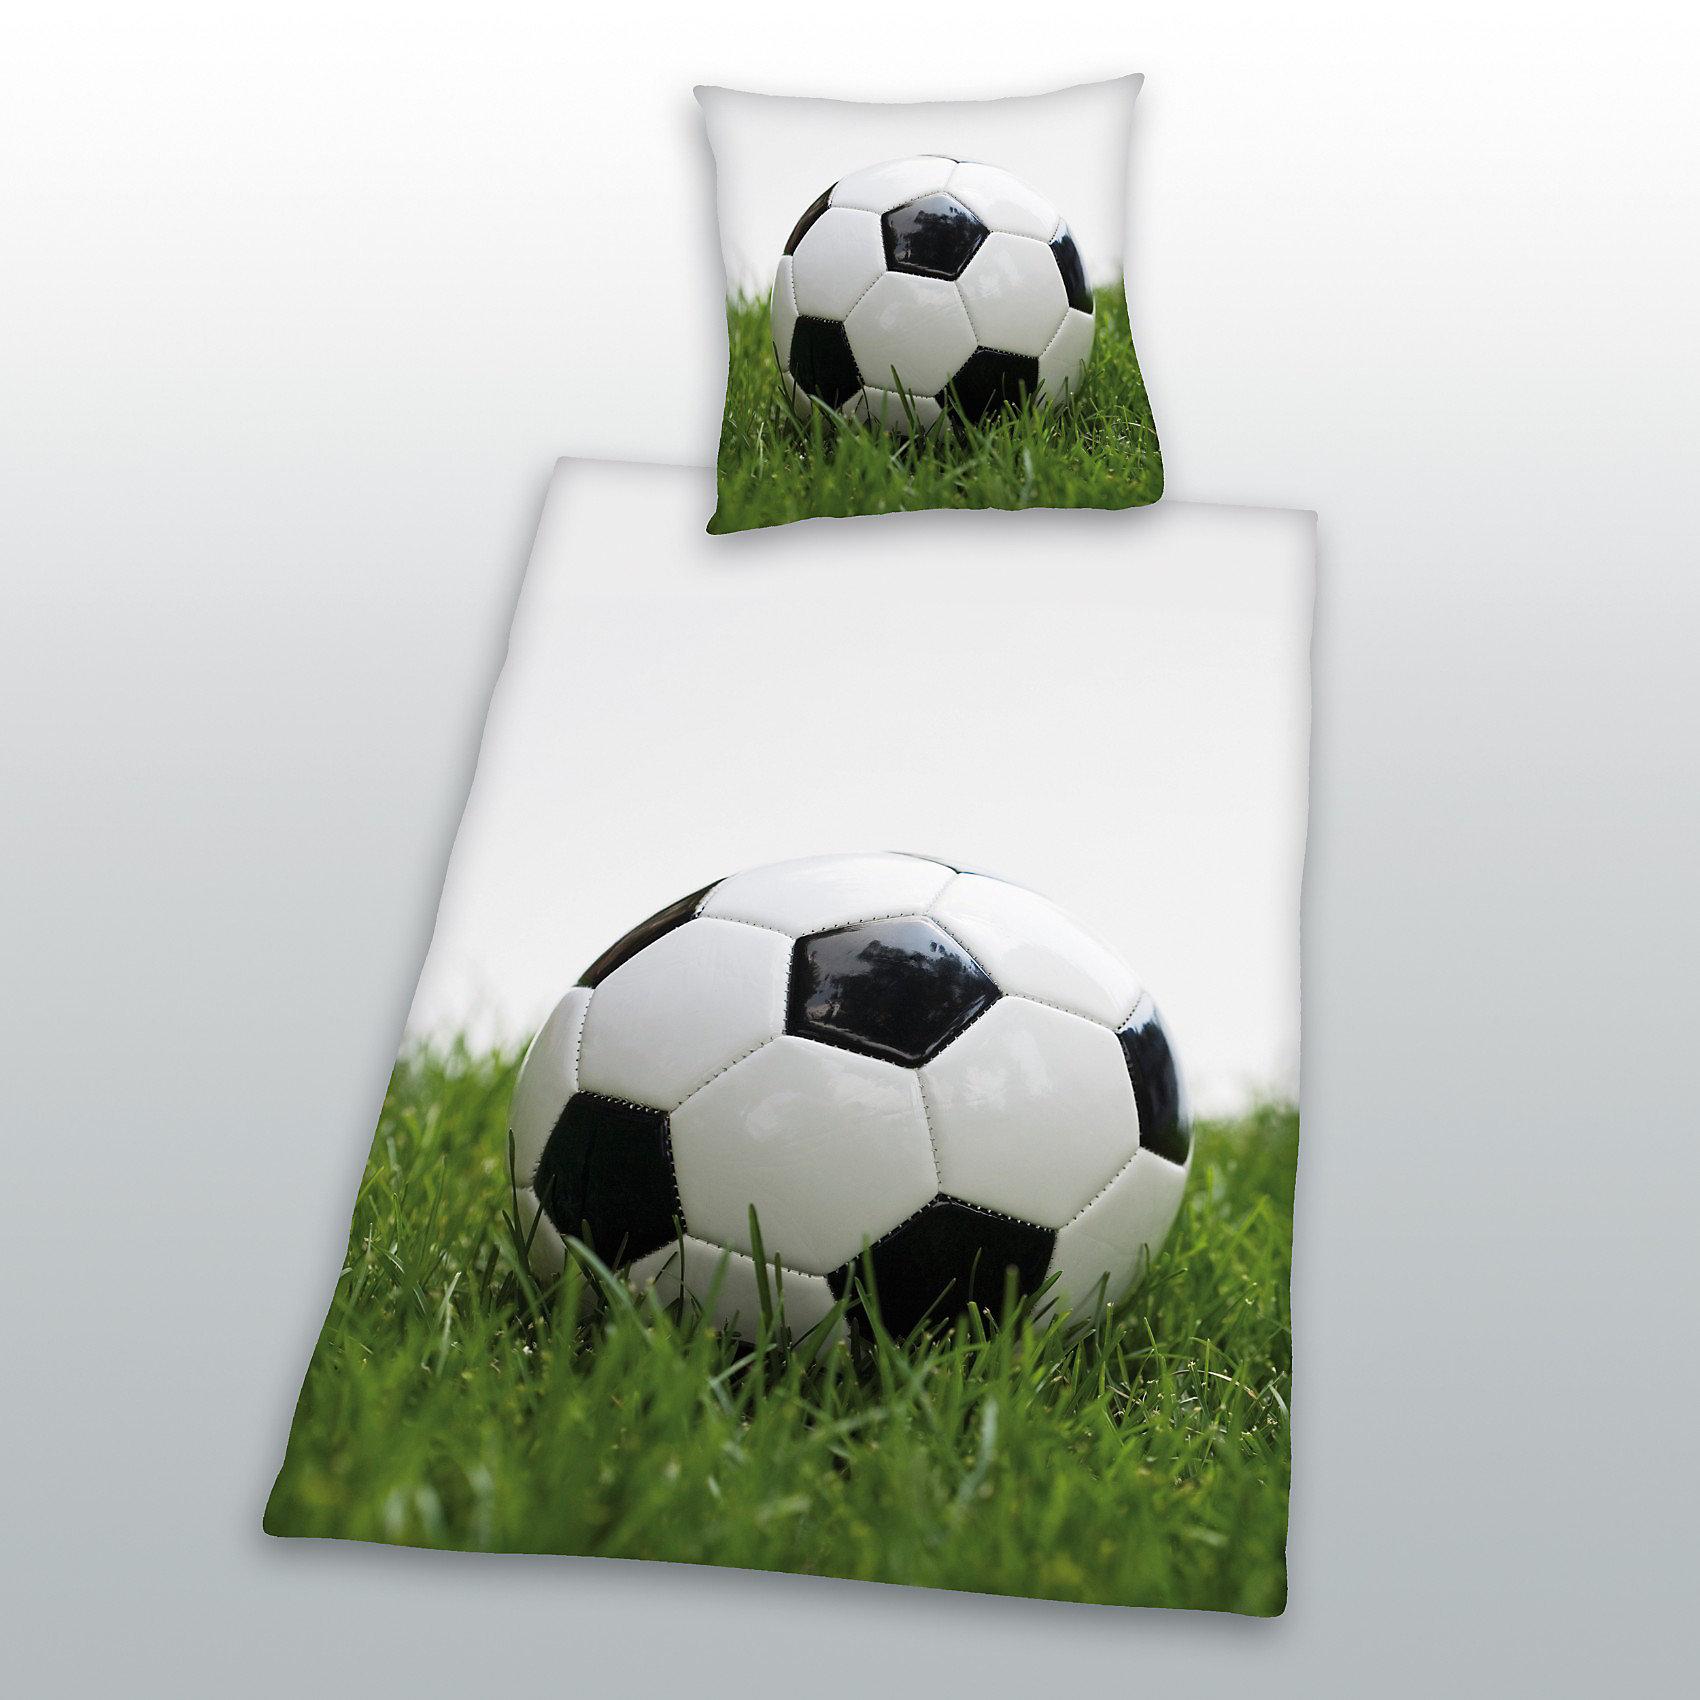 kinderbettwaesche fussball biber 135 x 200 cm. Black Bedroom Furniture Sets. Home Design Ideas